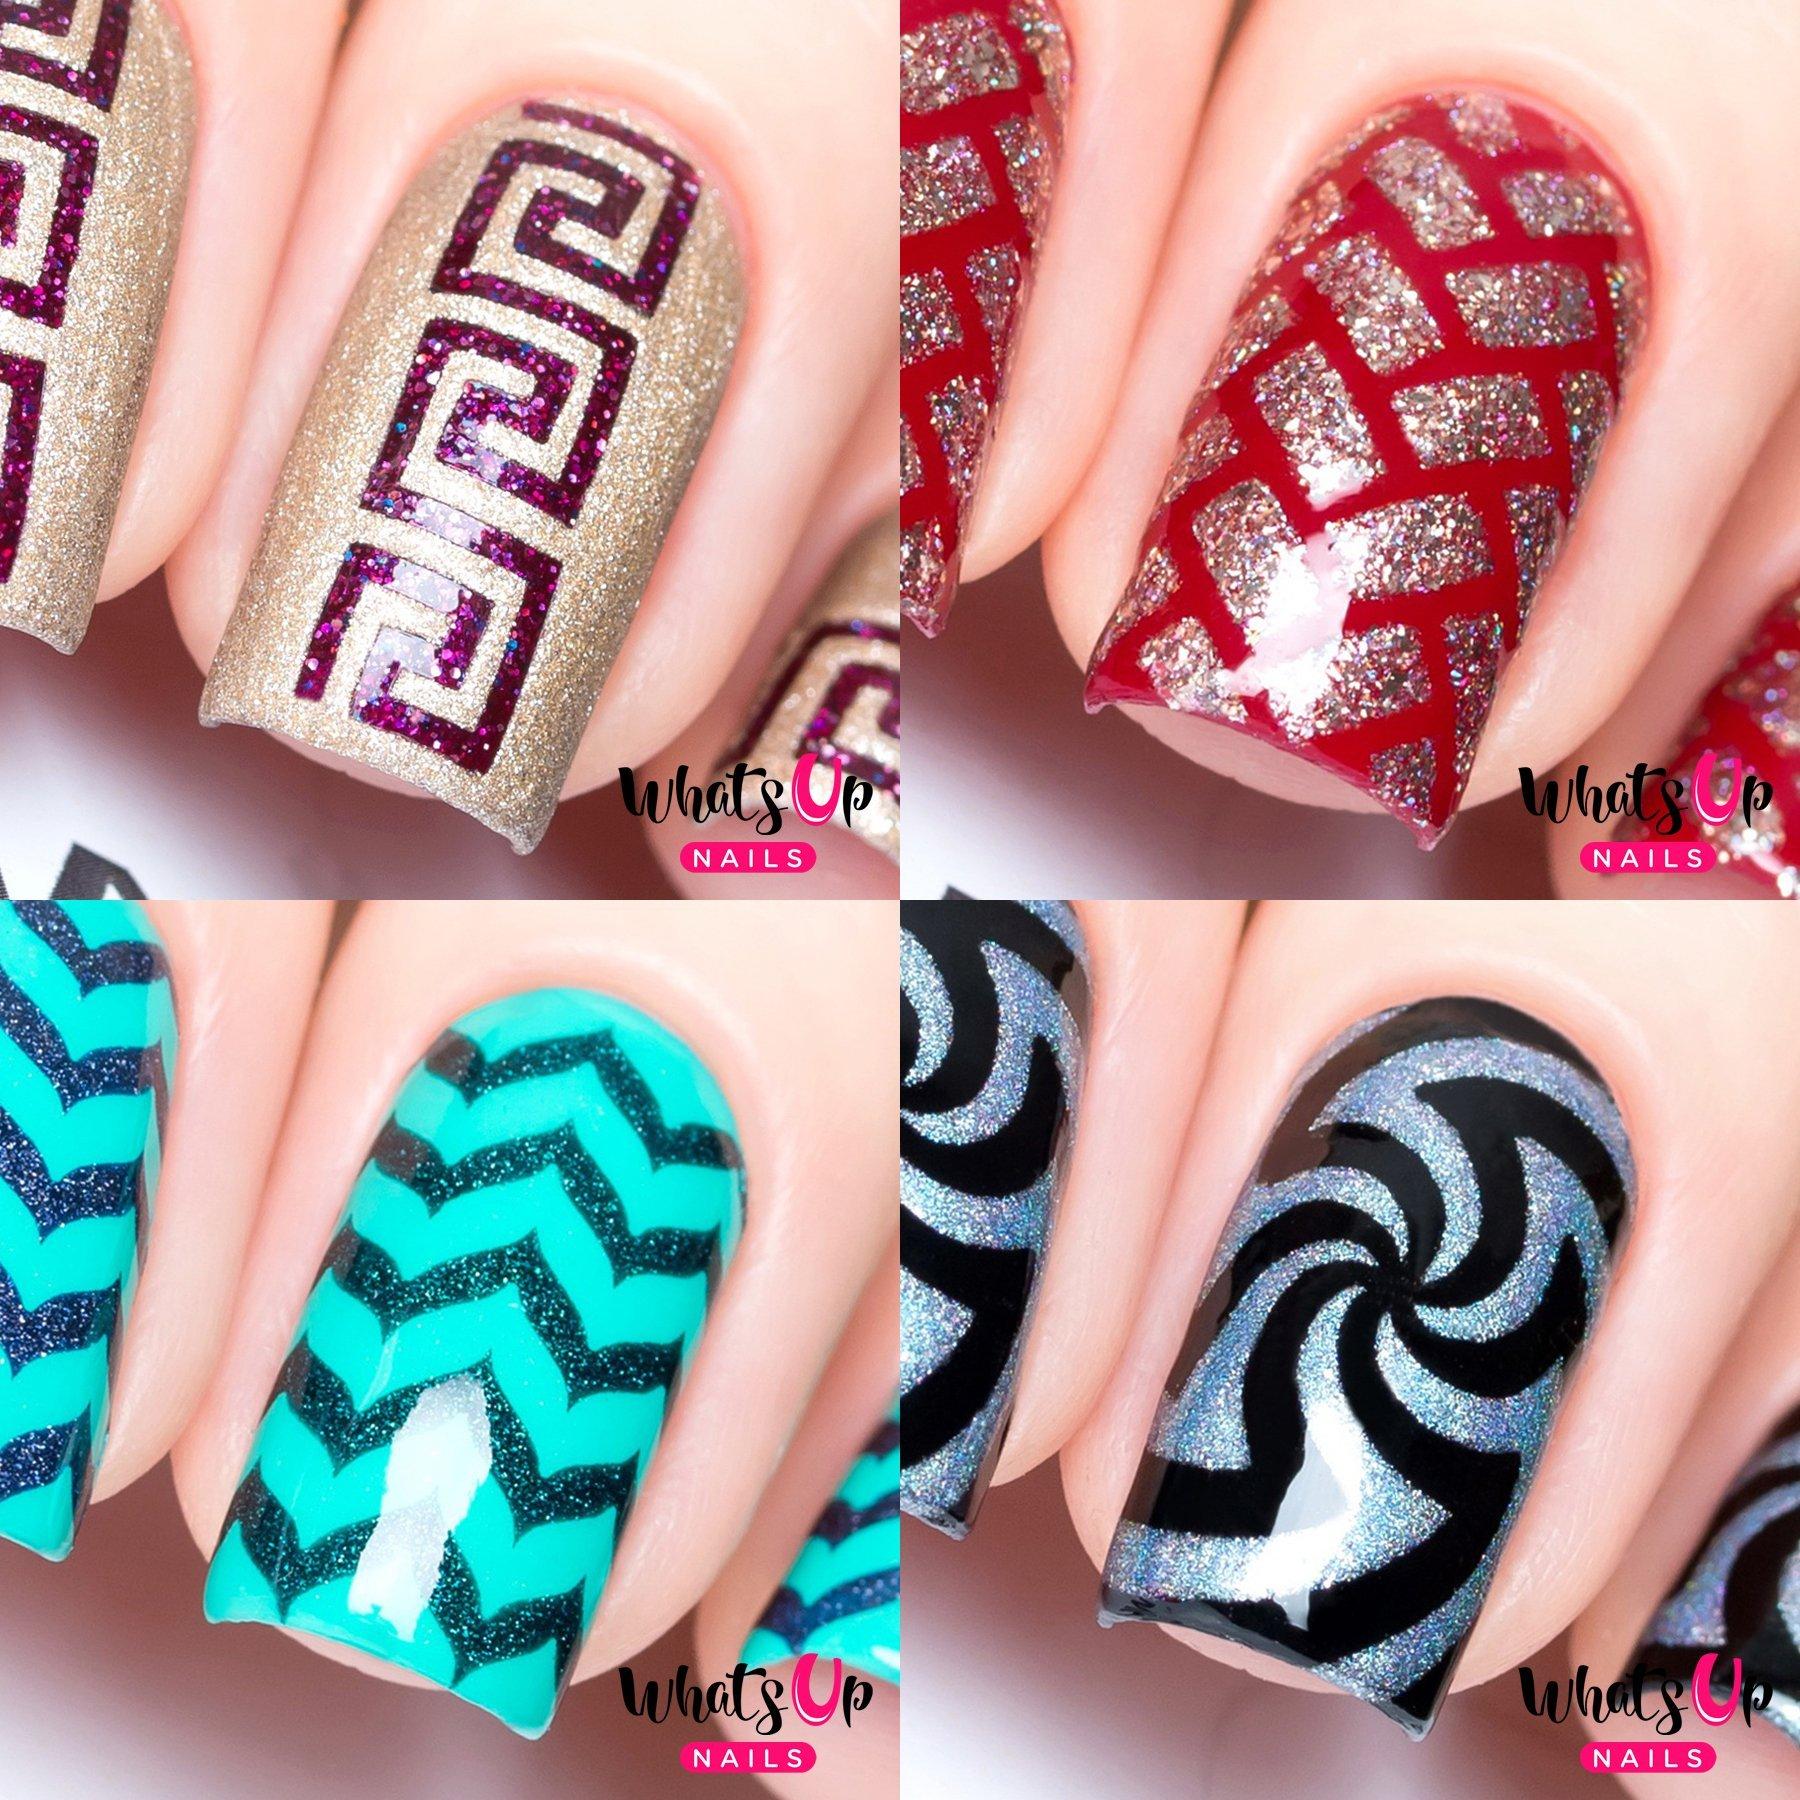 Amazon whats up nails nail vinyl stencils variety pack 4pcs whats up nails nail vinyl stencils variety pack 4pcs greek herringbone marbled solutioingenieria Choice Image